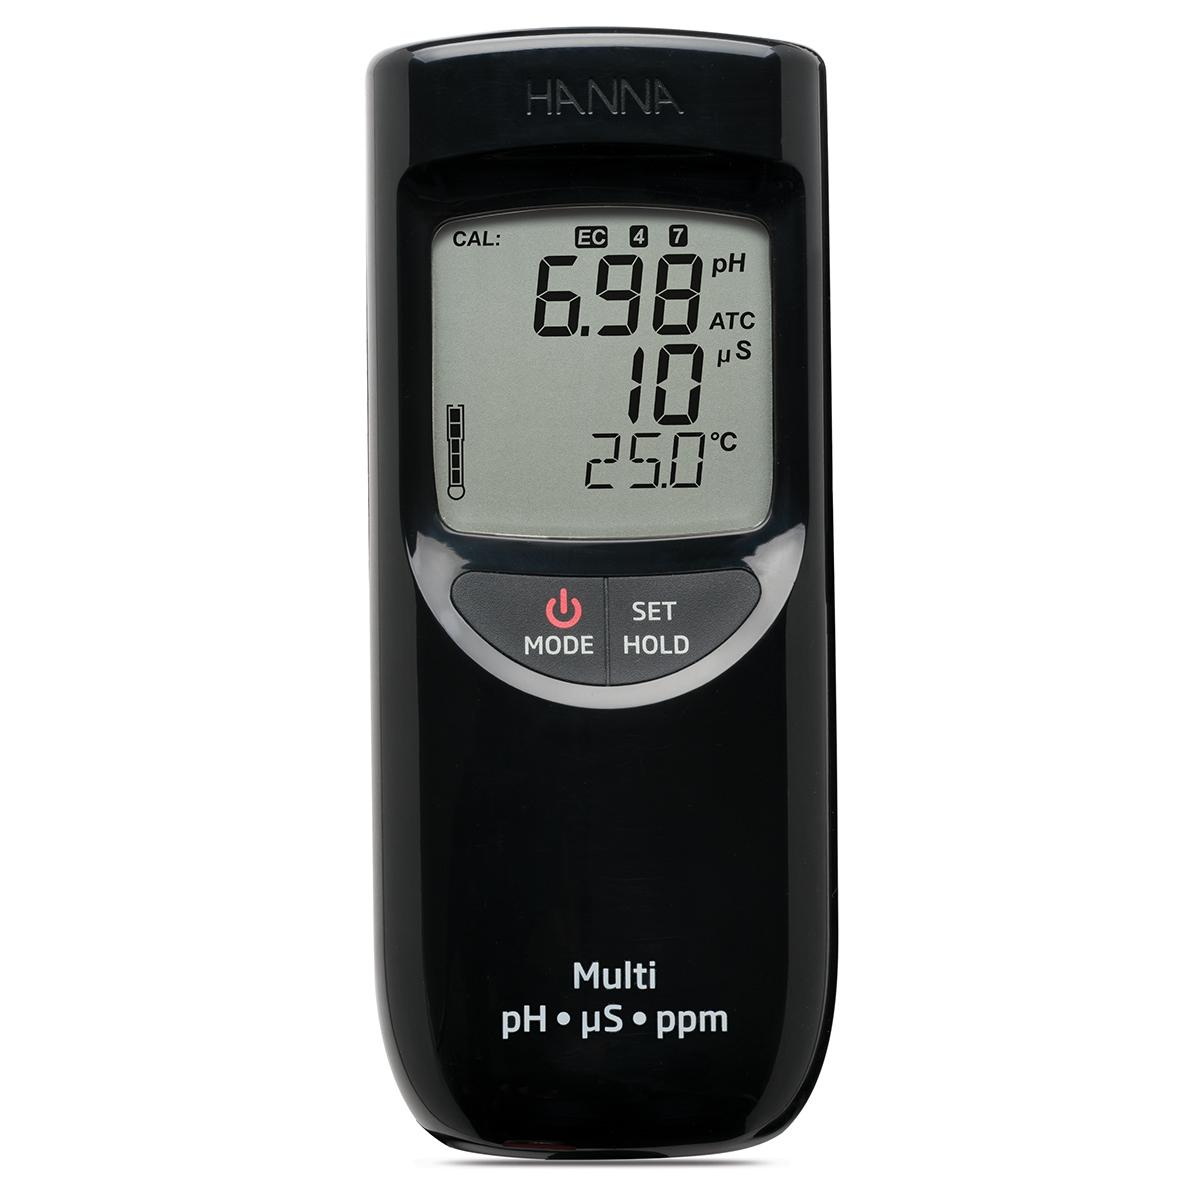 HI991300 Portable Waterproof pH/EC/TDS Meter (Low Range)